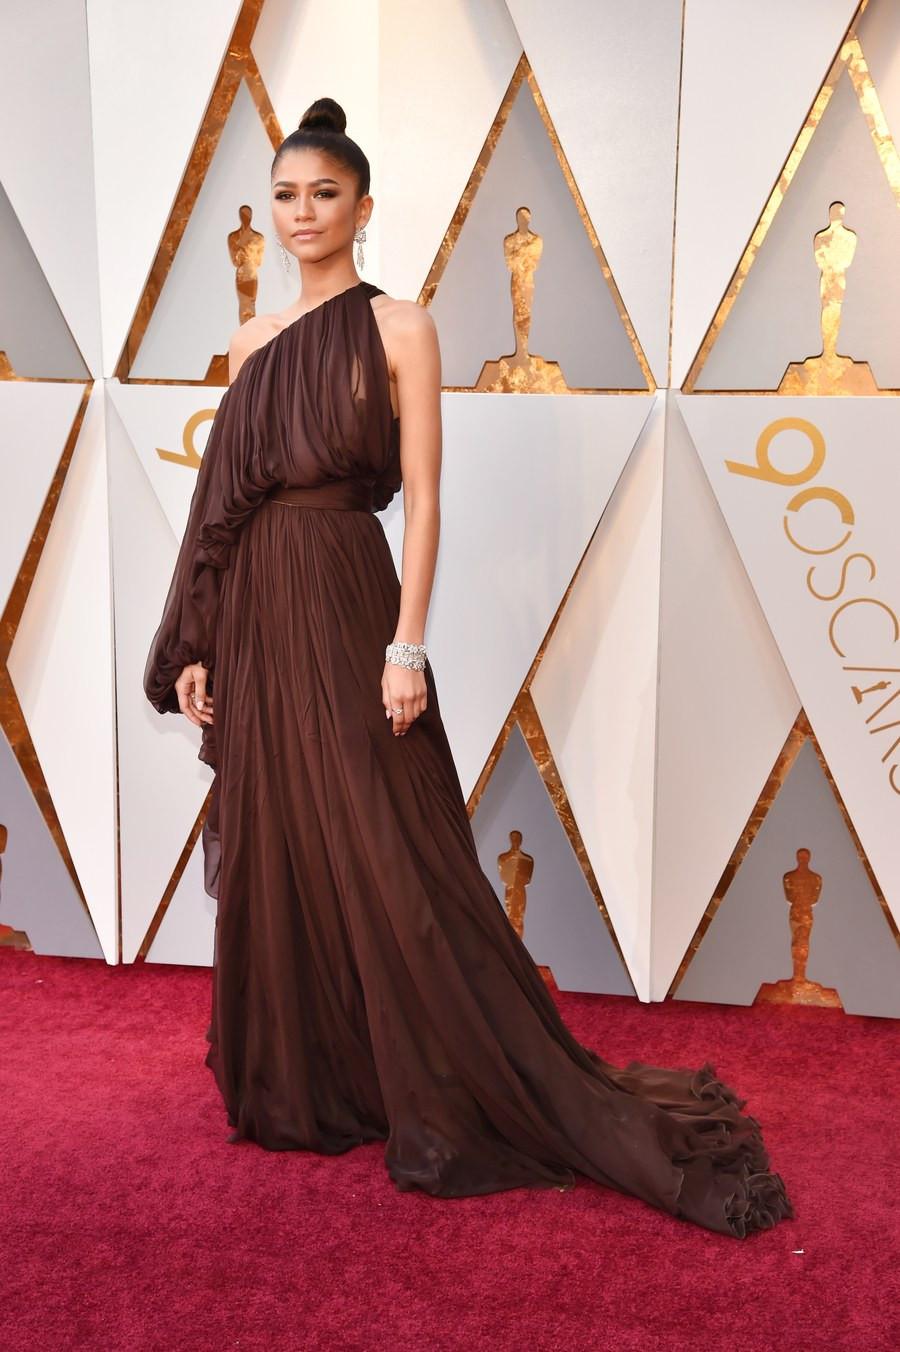 Zendaya wearing Giambatista Valli Oscars 2018